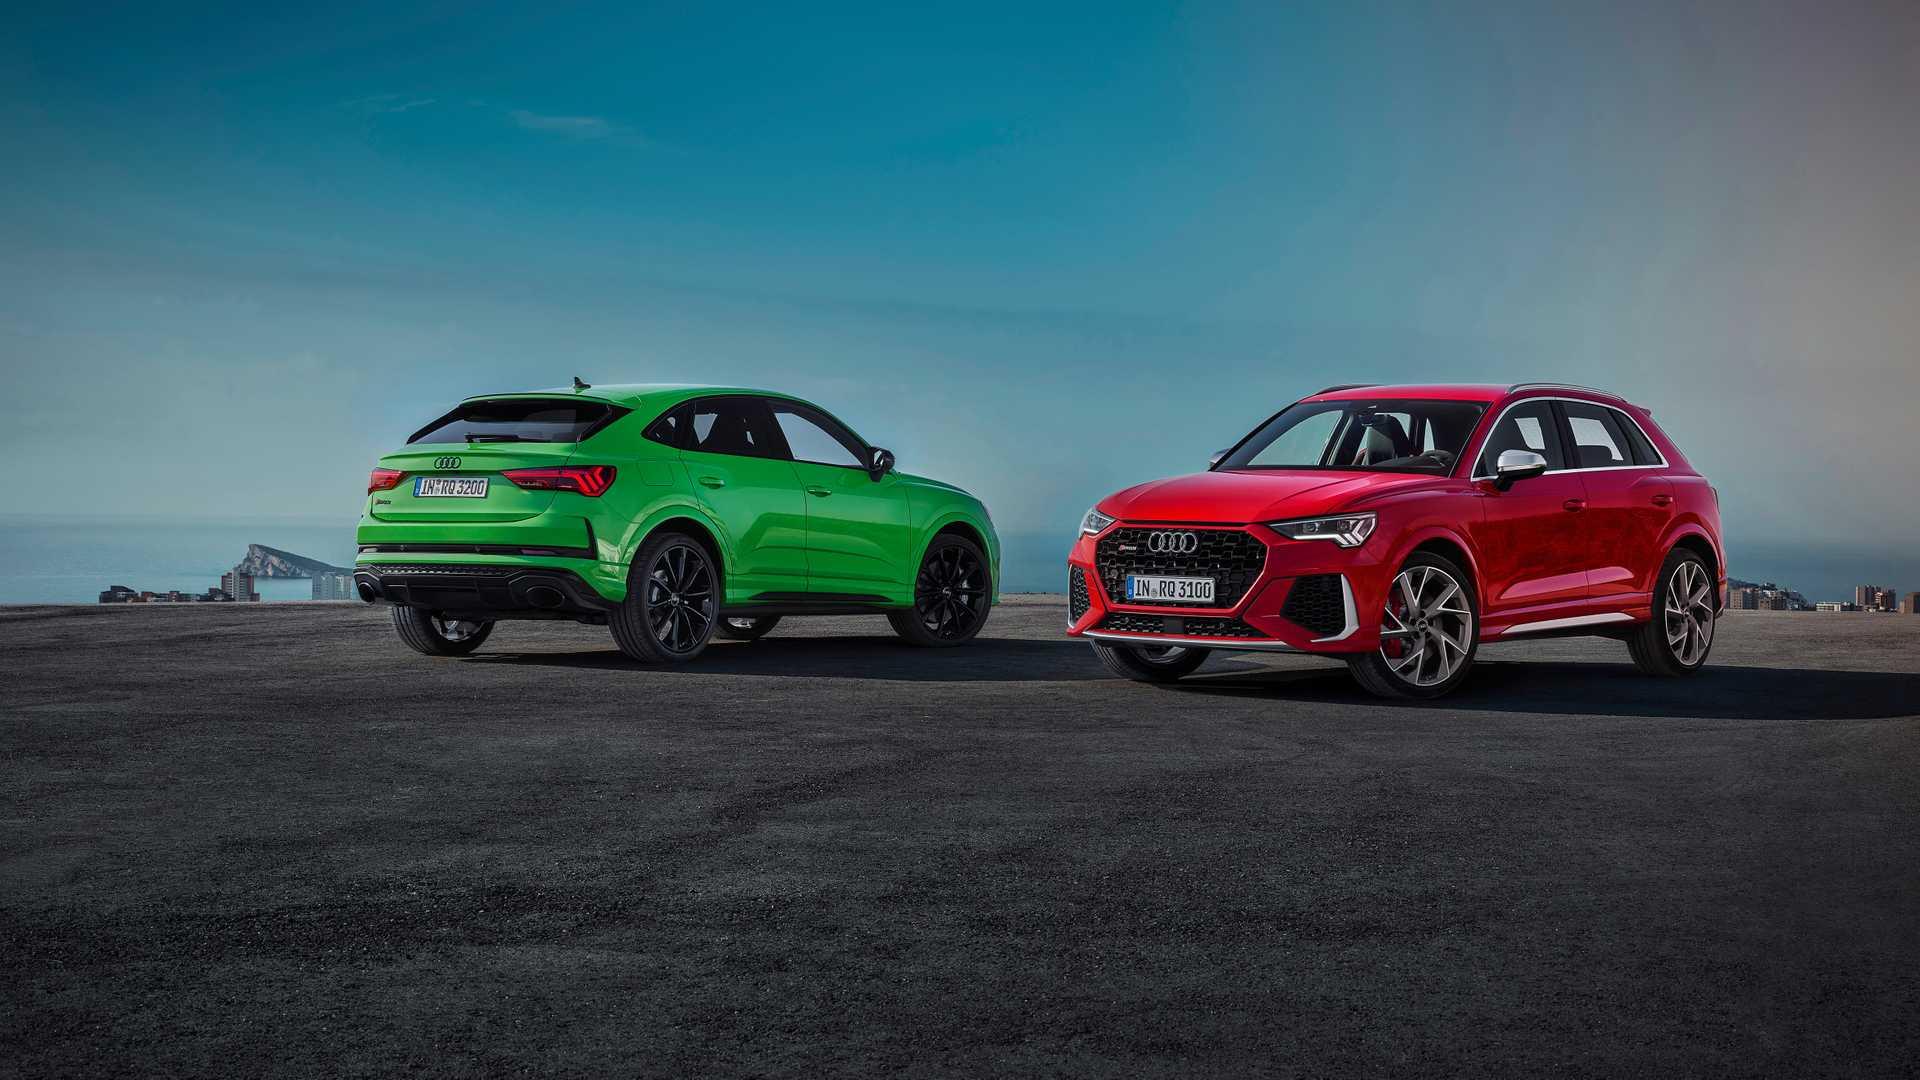 RS Q3 & Sportback, MSO Apex, BMW Neerpasch – întrunirea motorsport